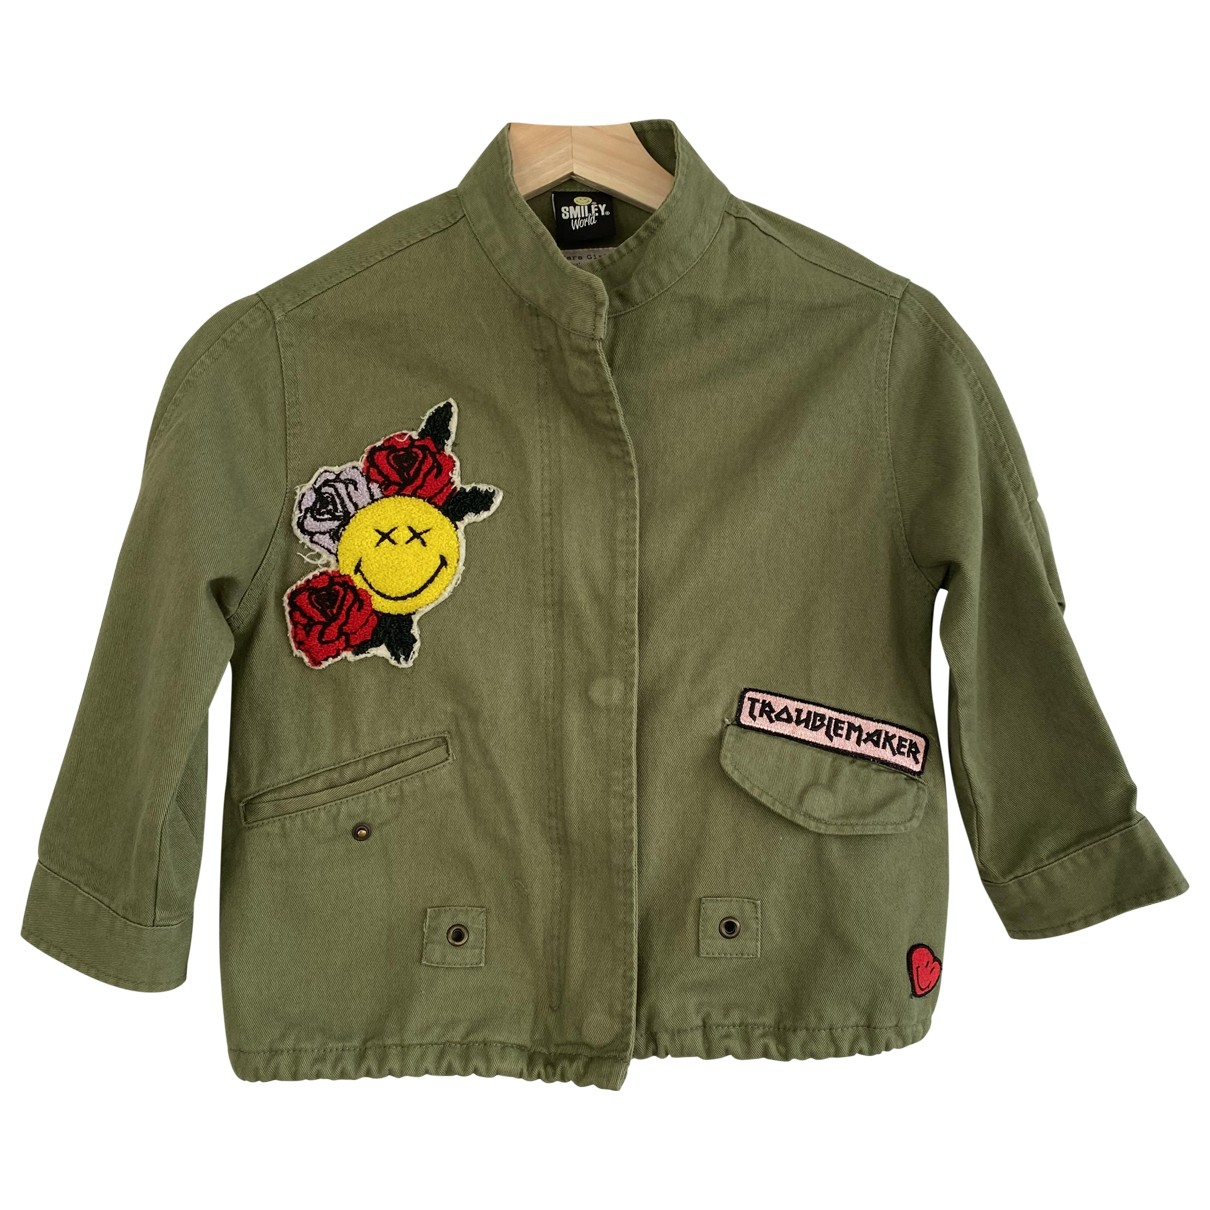 Zara N Khaki Cotton jacket & coat for Kids 6 years - until 45 inches UK